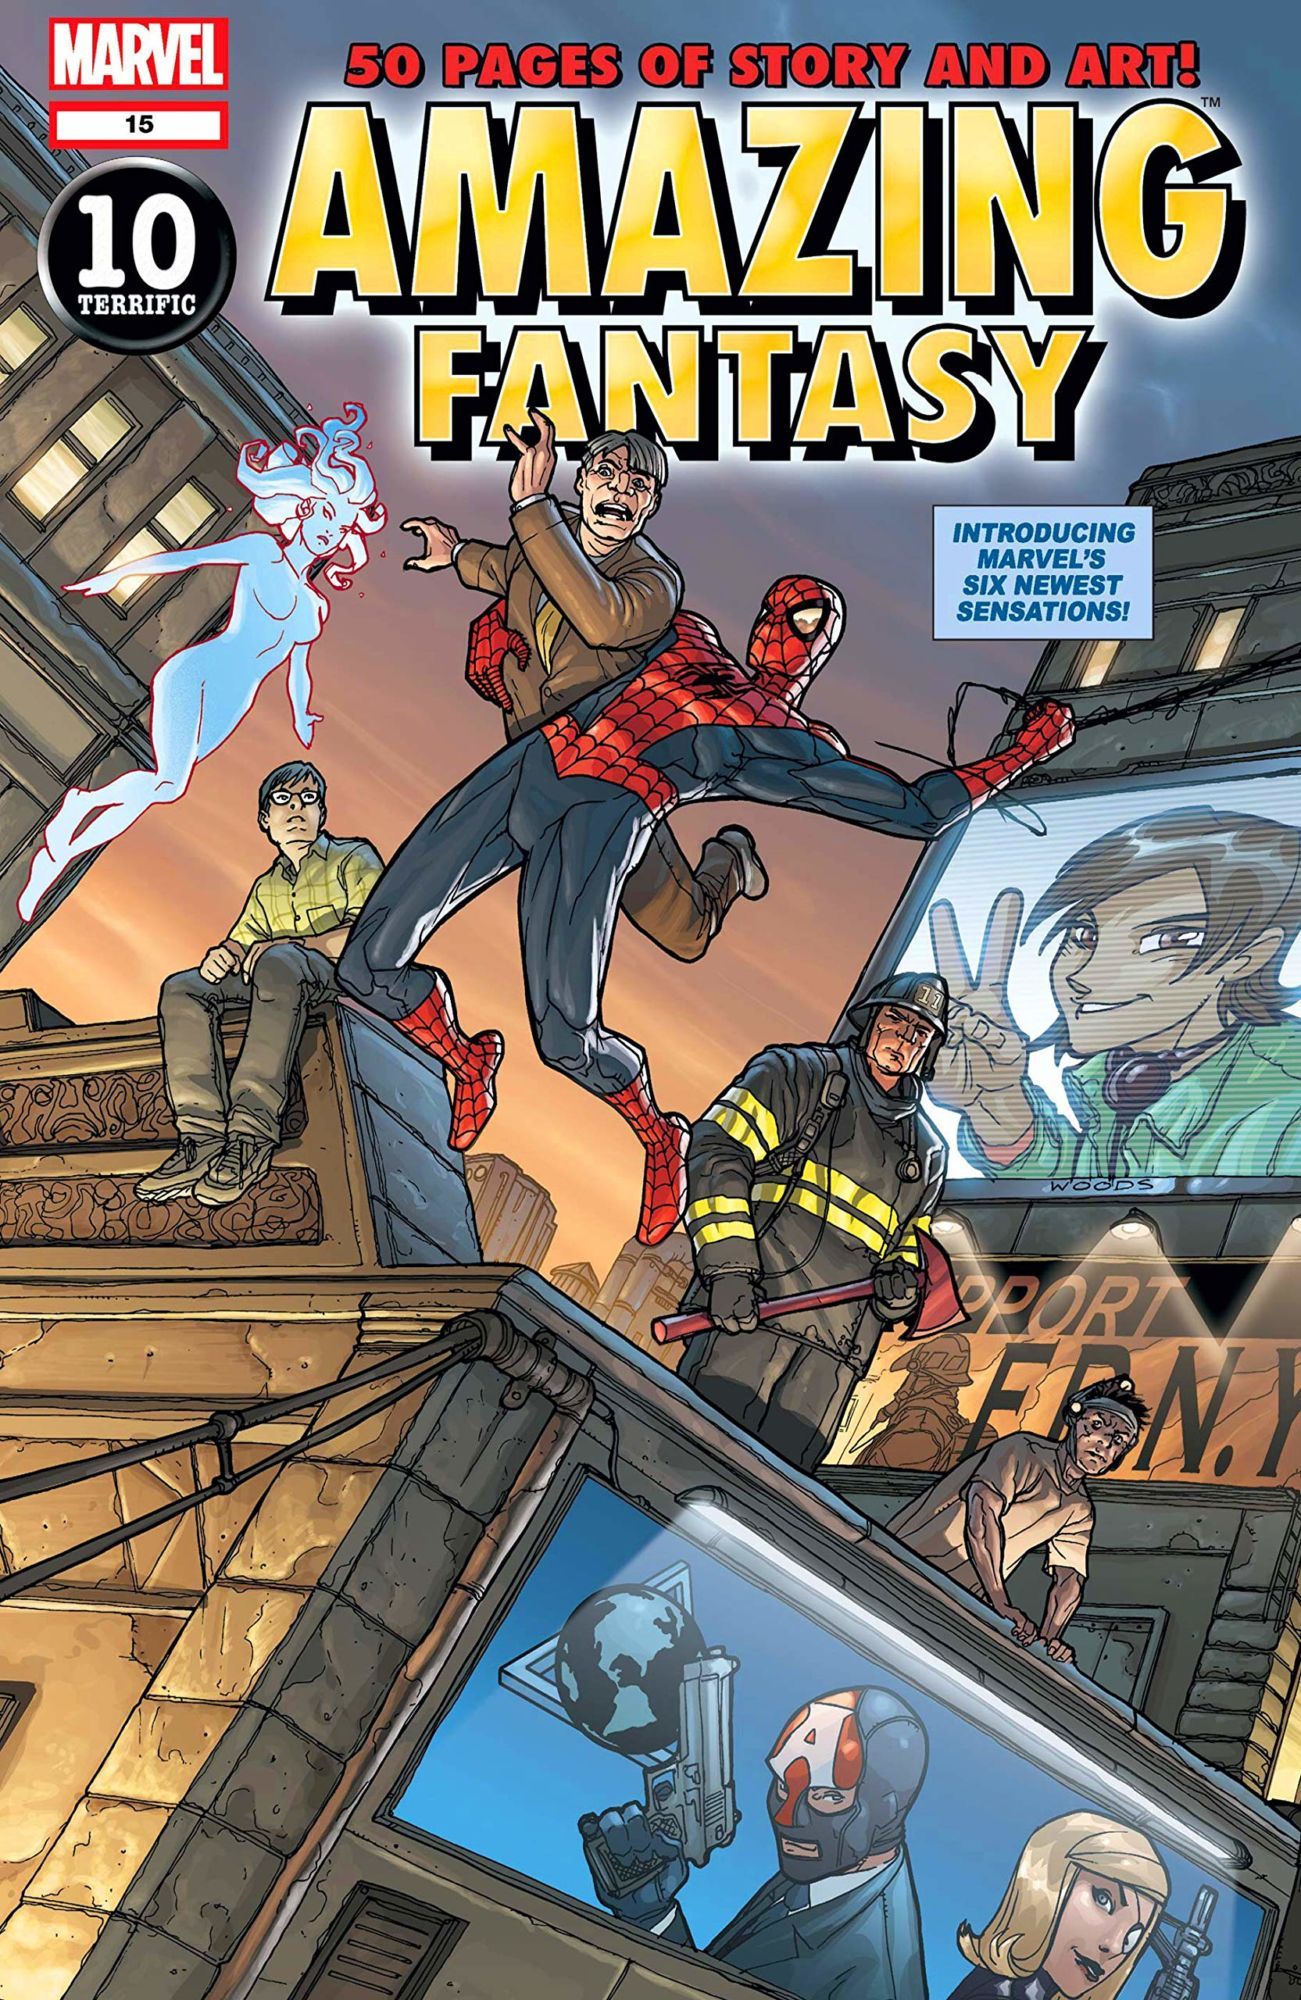 Marvel Comics to Publish Amazing Fantasy Omnibus – But Which Amazing Fantasy?